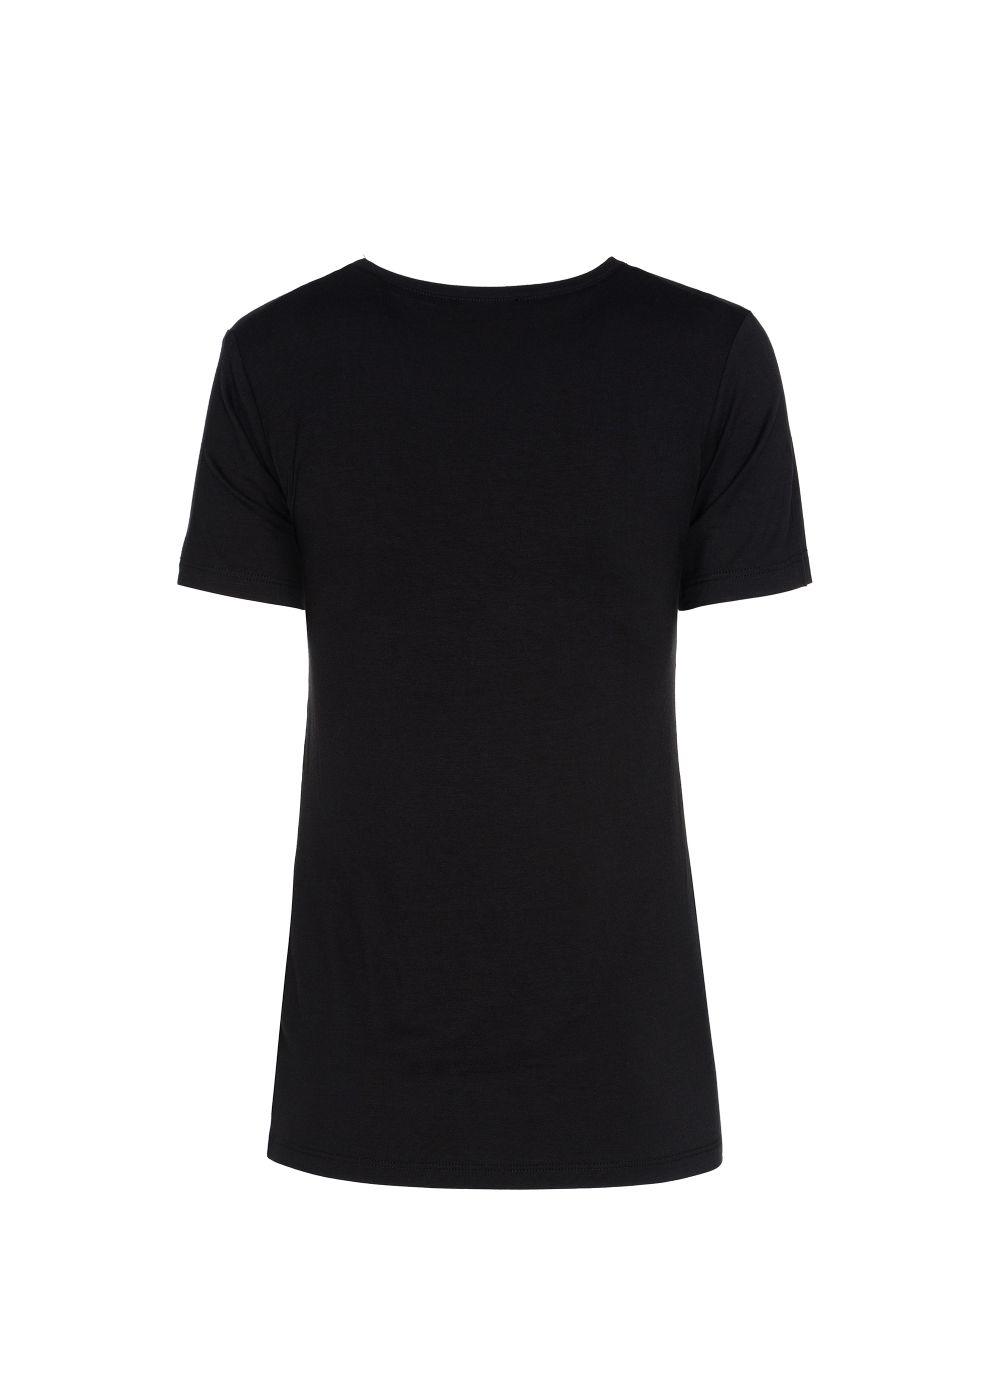 T-shirt damski TSHDT-0038-99(W19)